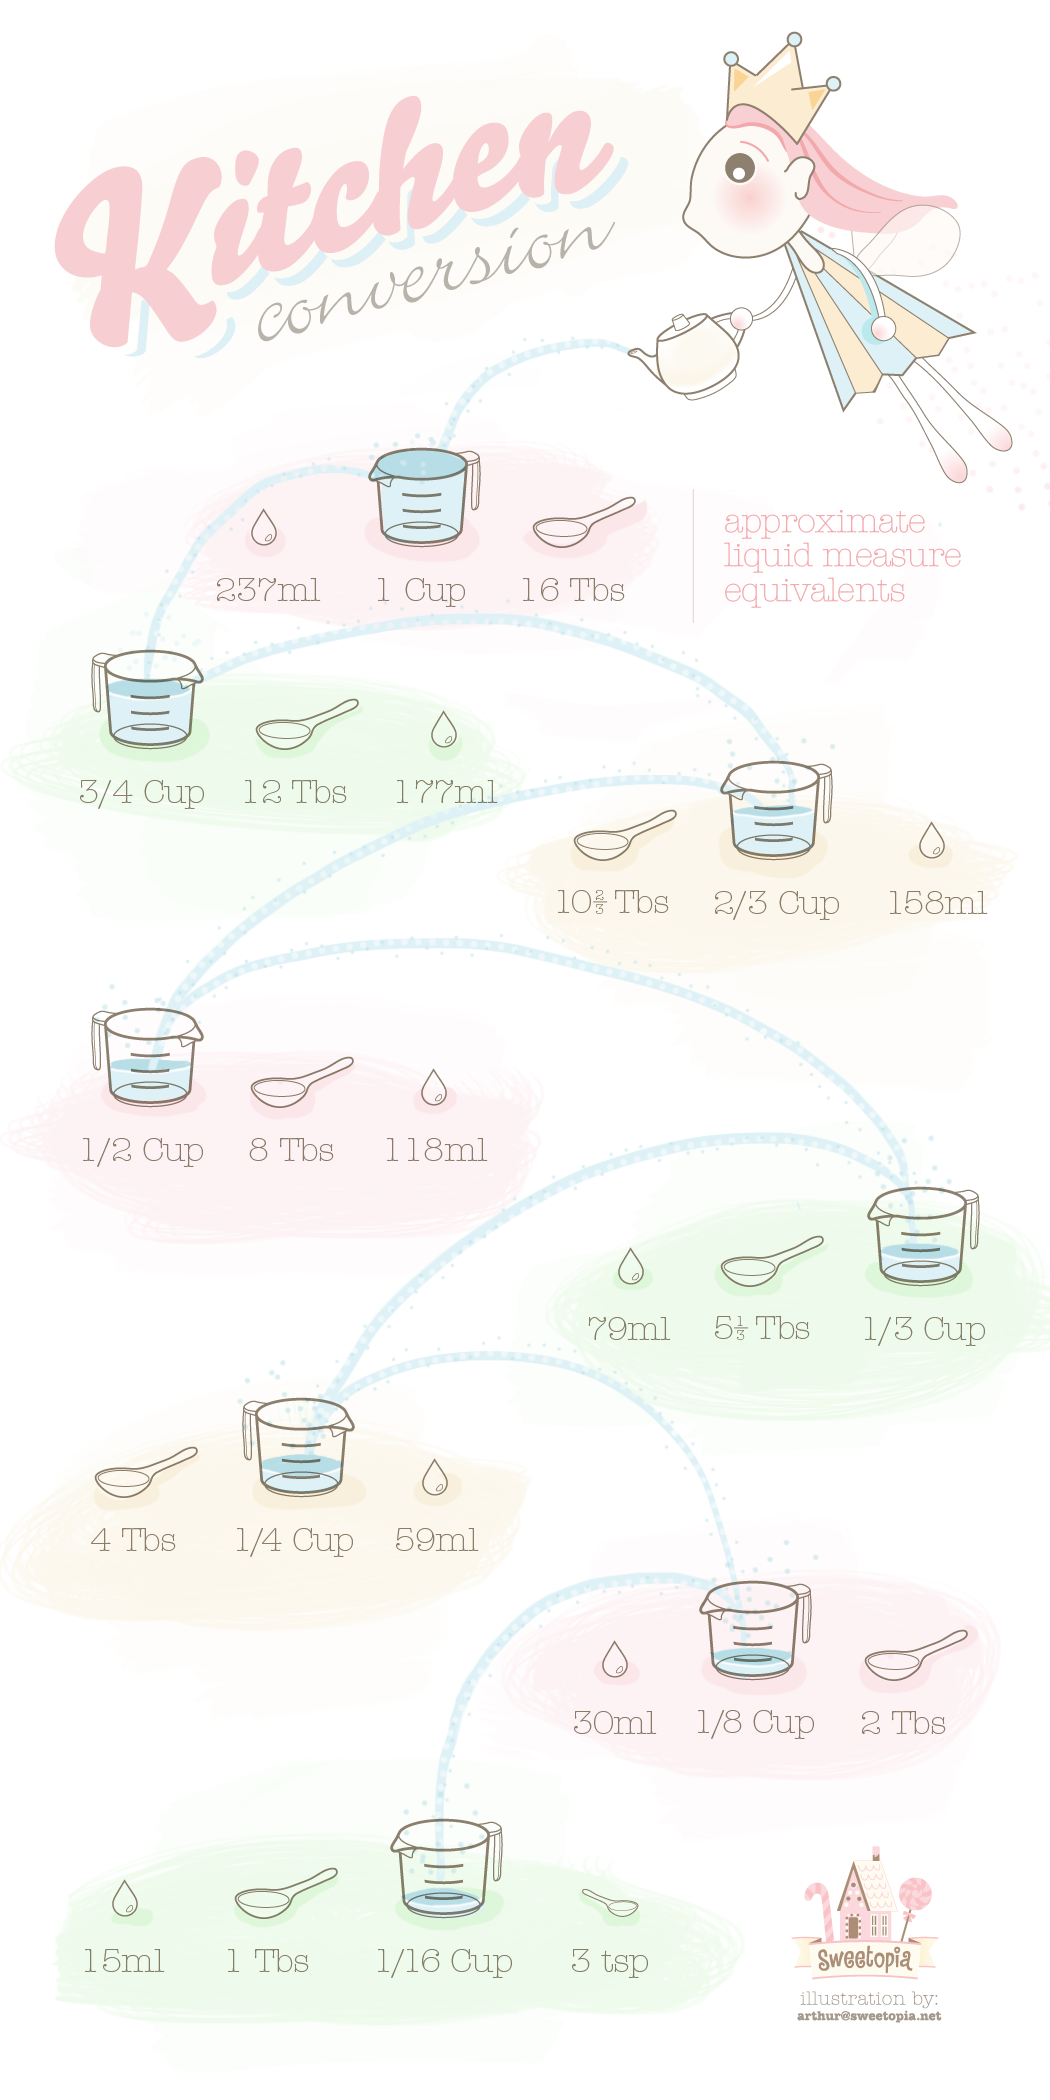 Liquid Measure Equivalents Illustration  Kitchen Conversion